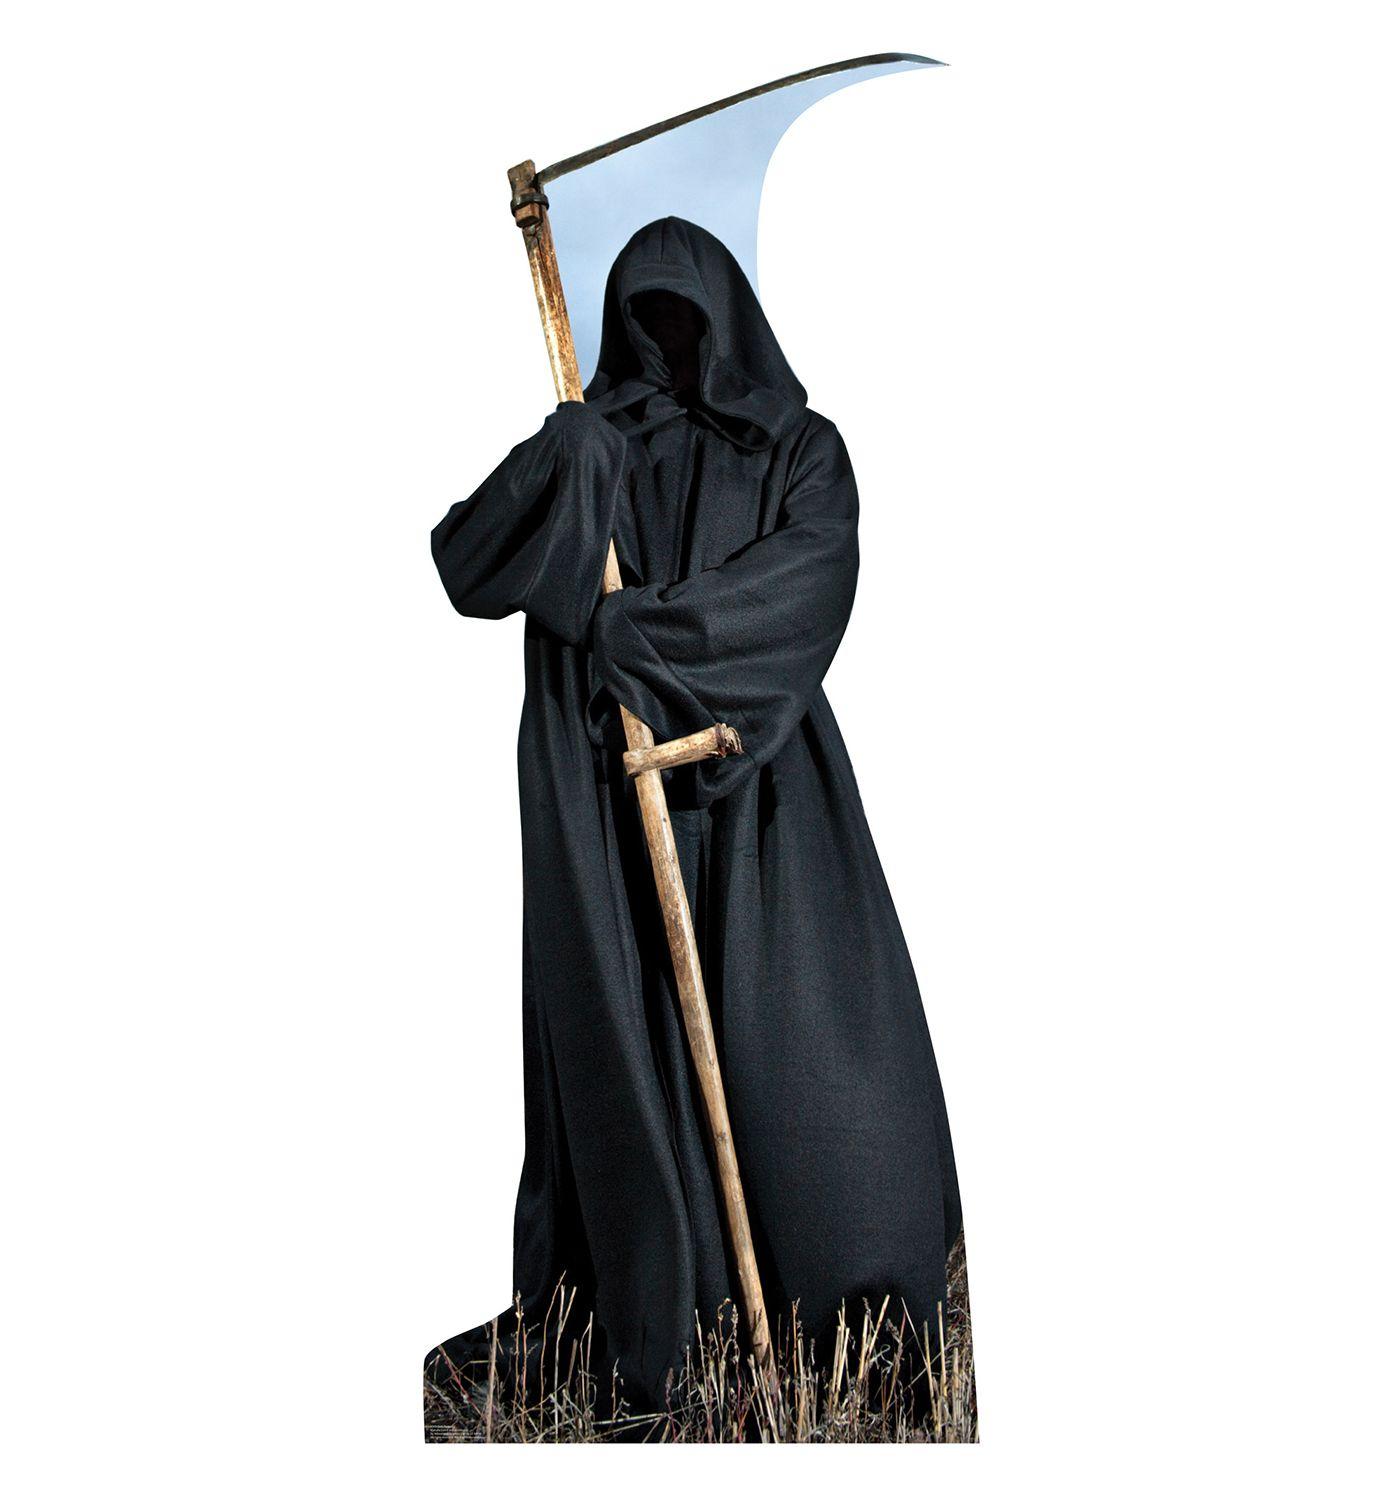 Grim Reaper SIZE: 79″x31″